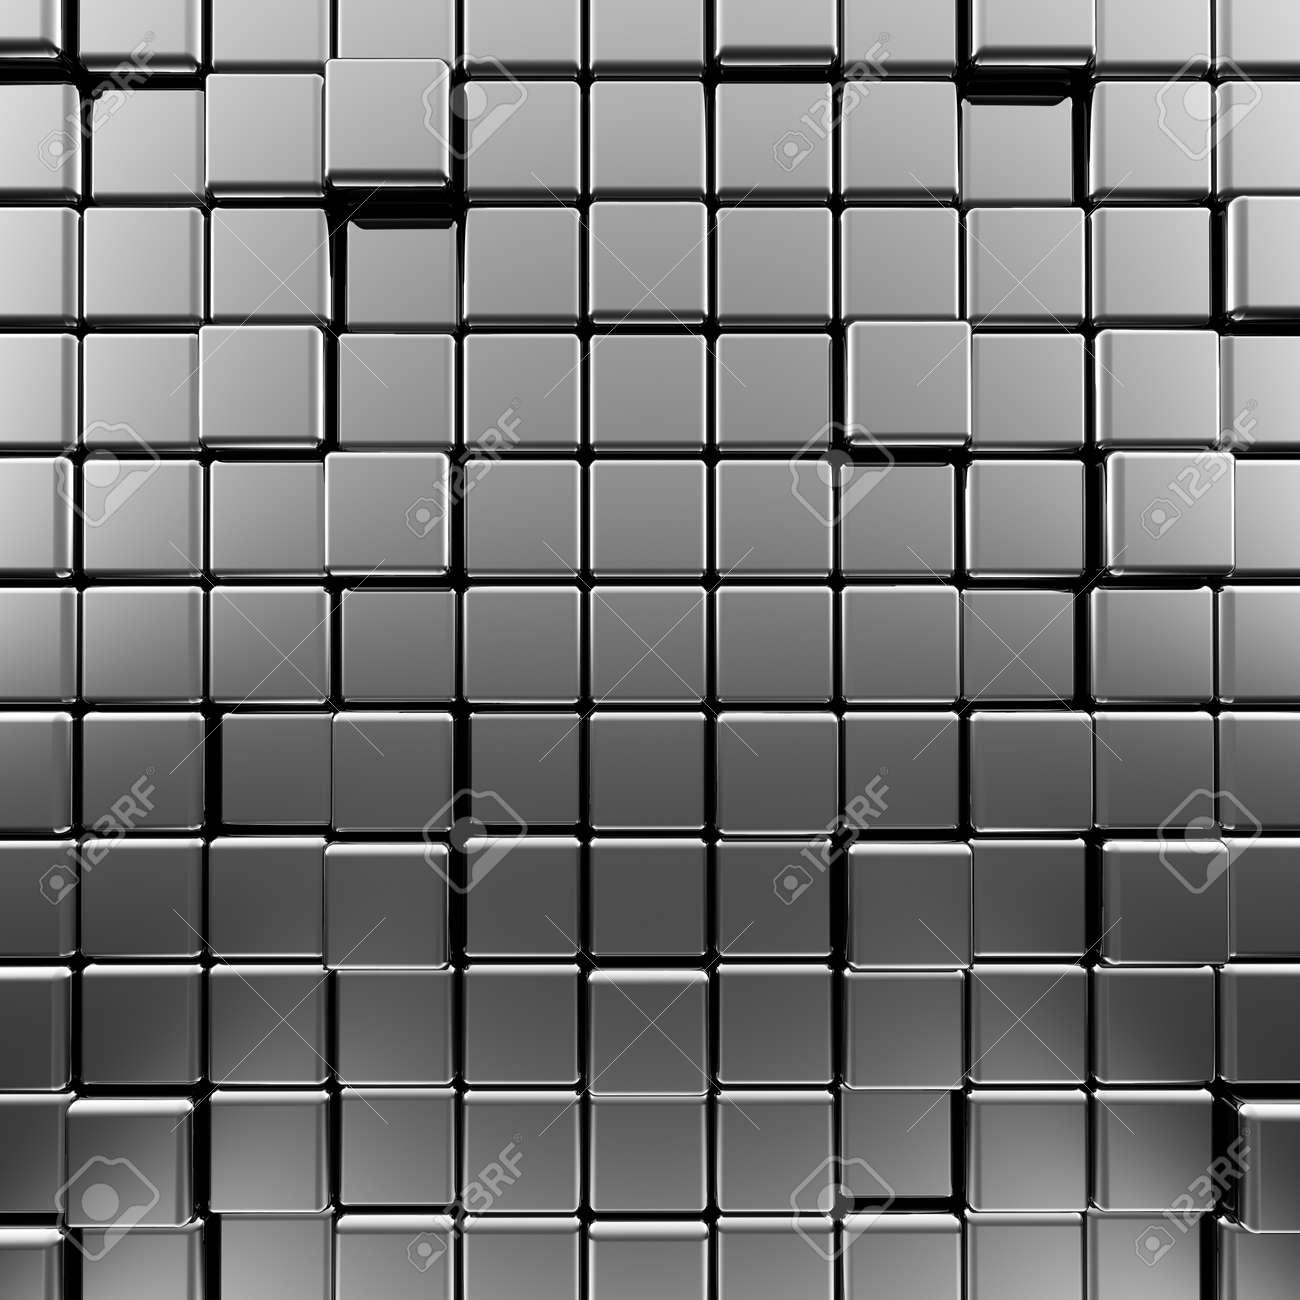 Metallic background  High quality 3d render Stock Photo - 17898036